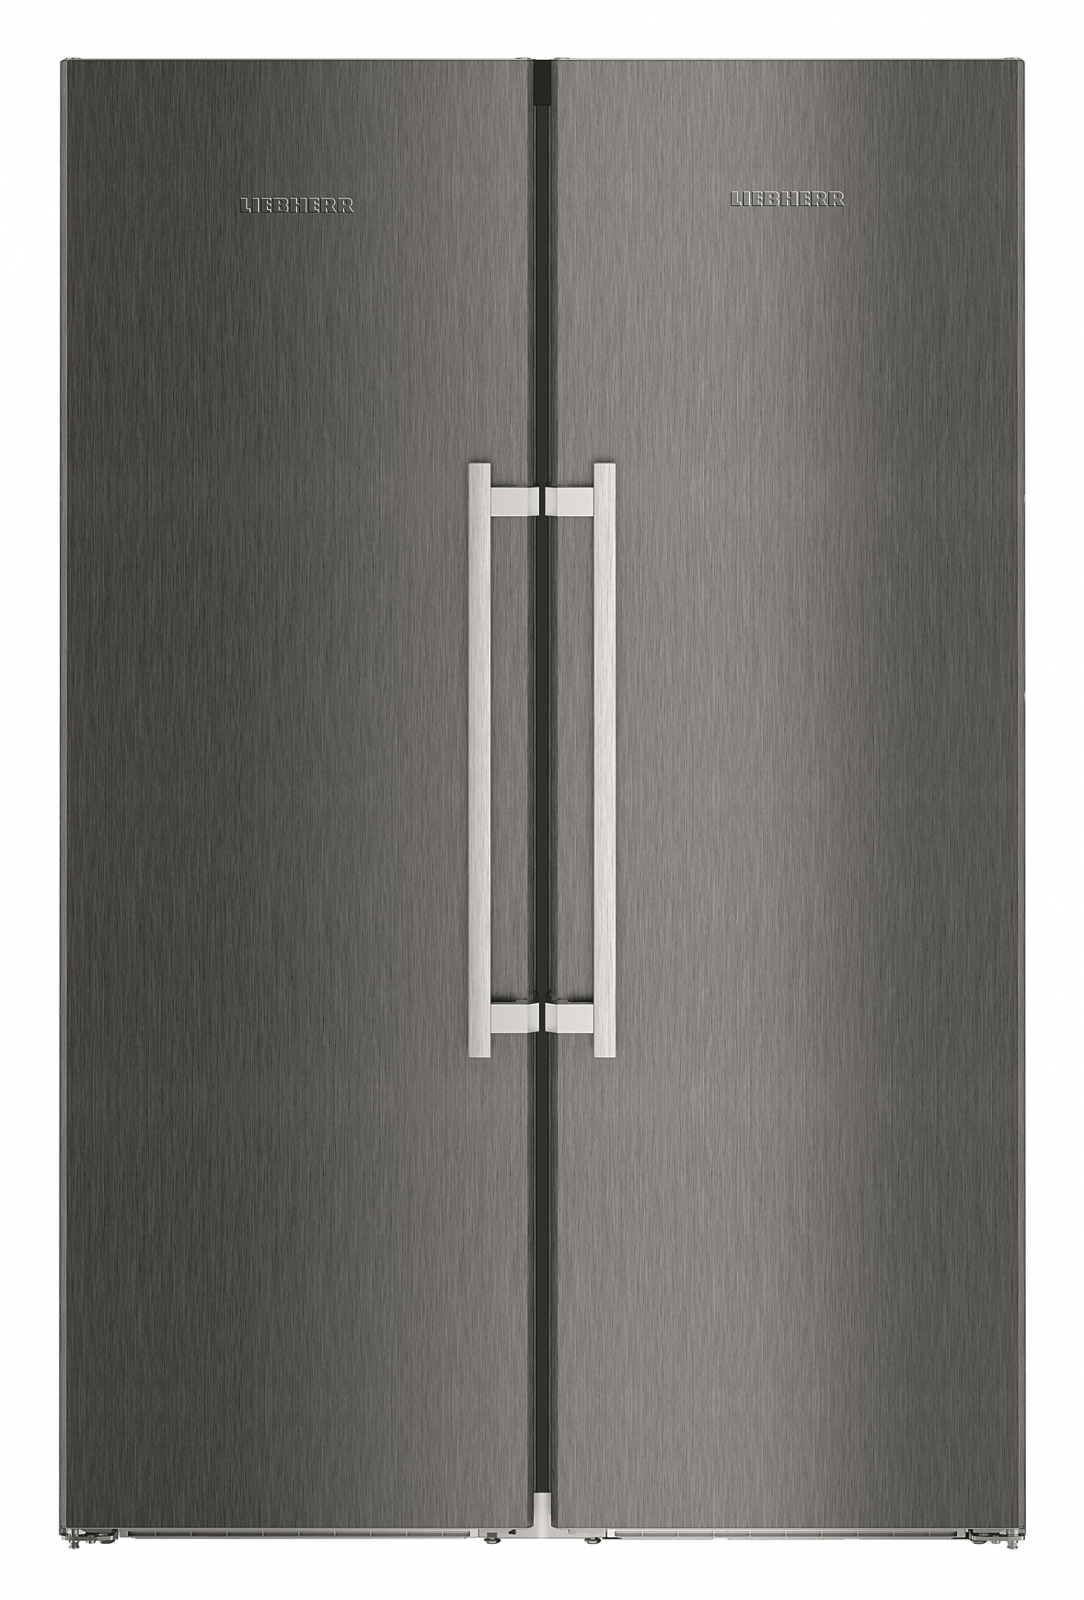 купить Side-by-Side холодильник Liebherr SBSbs 8673 Украина фото 1